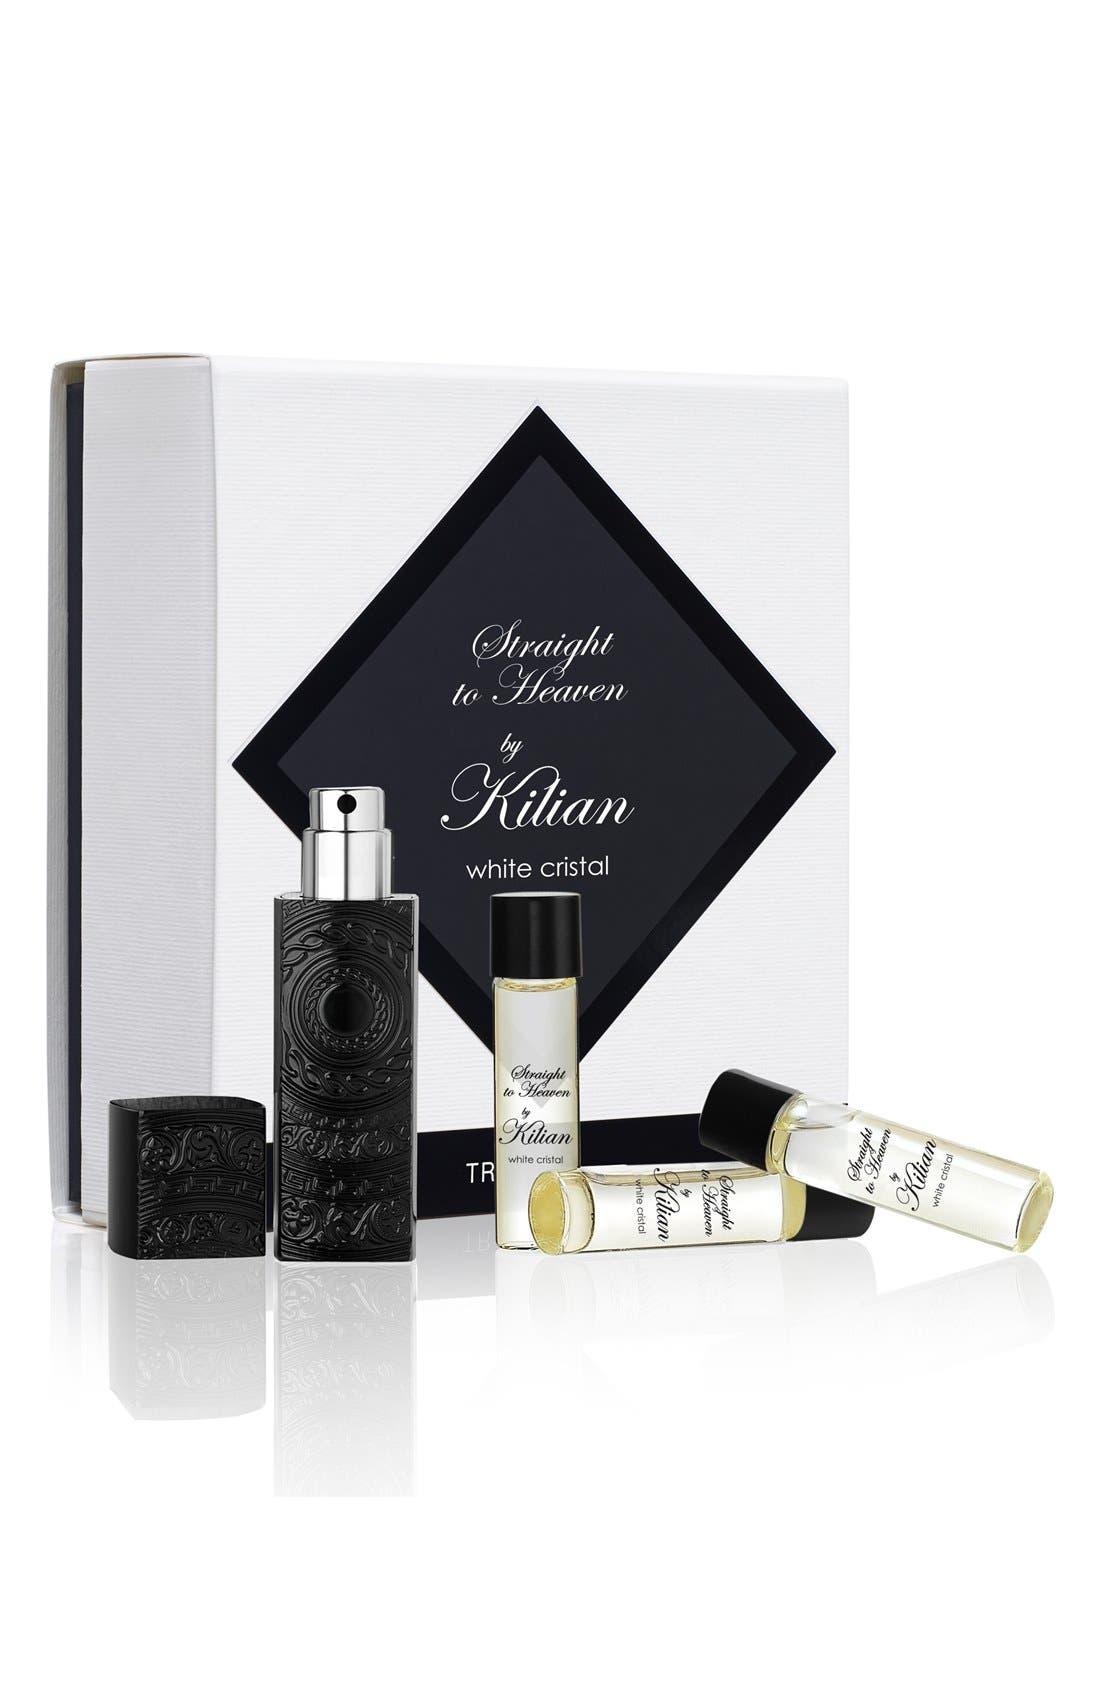 Kilian 'L'Oeuvre Noire - Straight to Heaven, white cristal' Travel Set